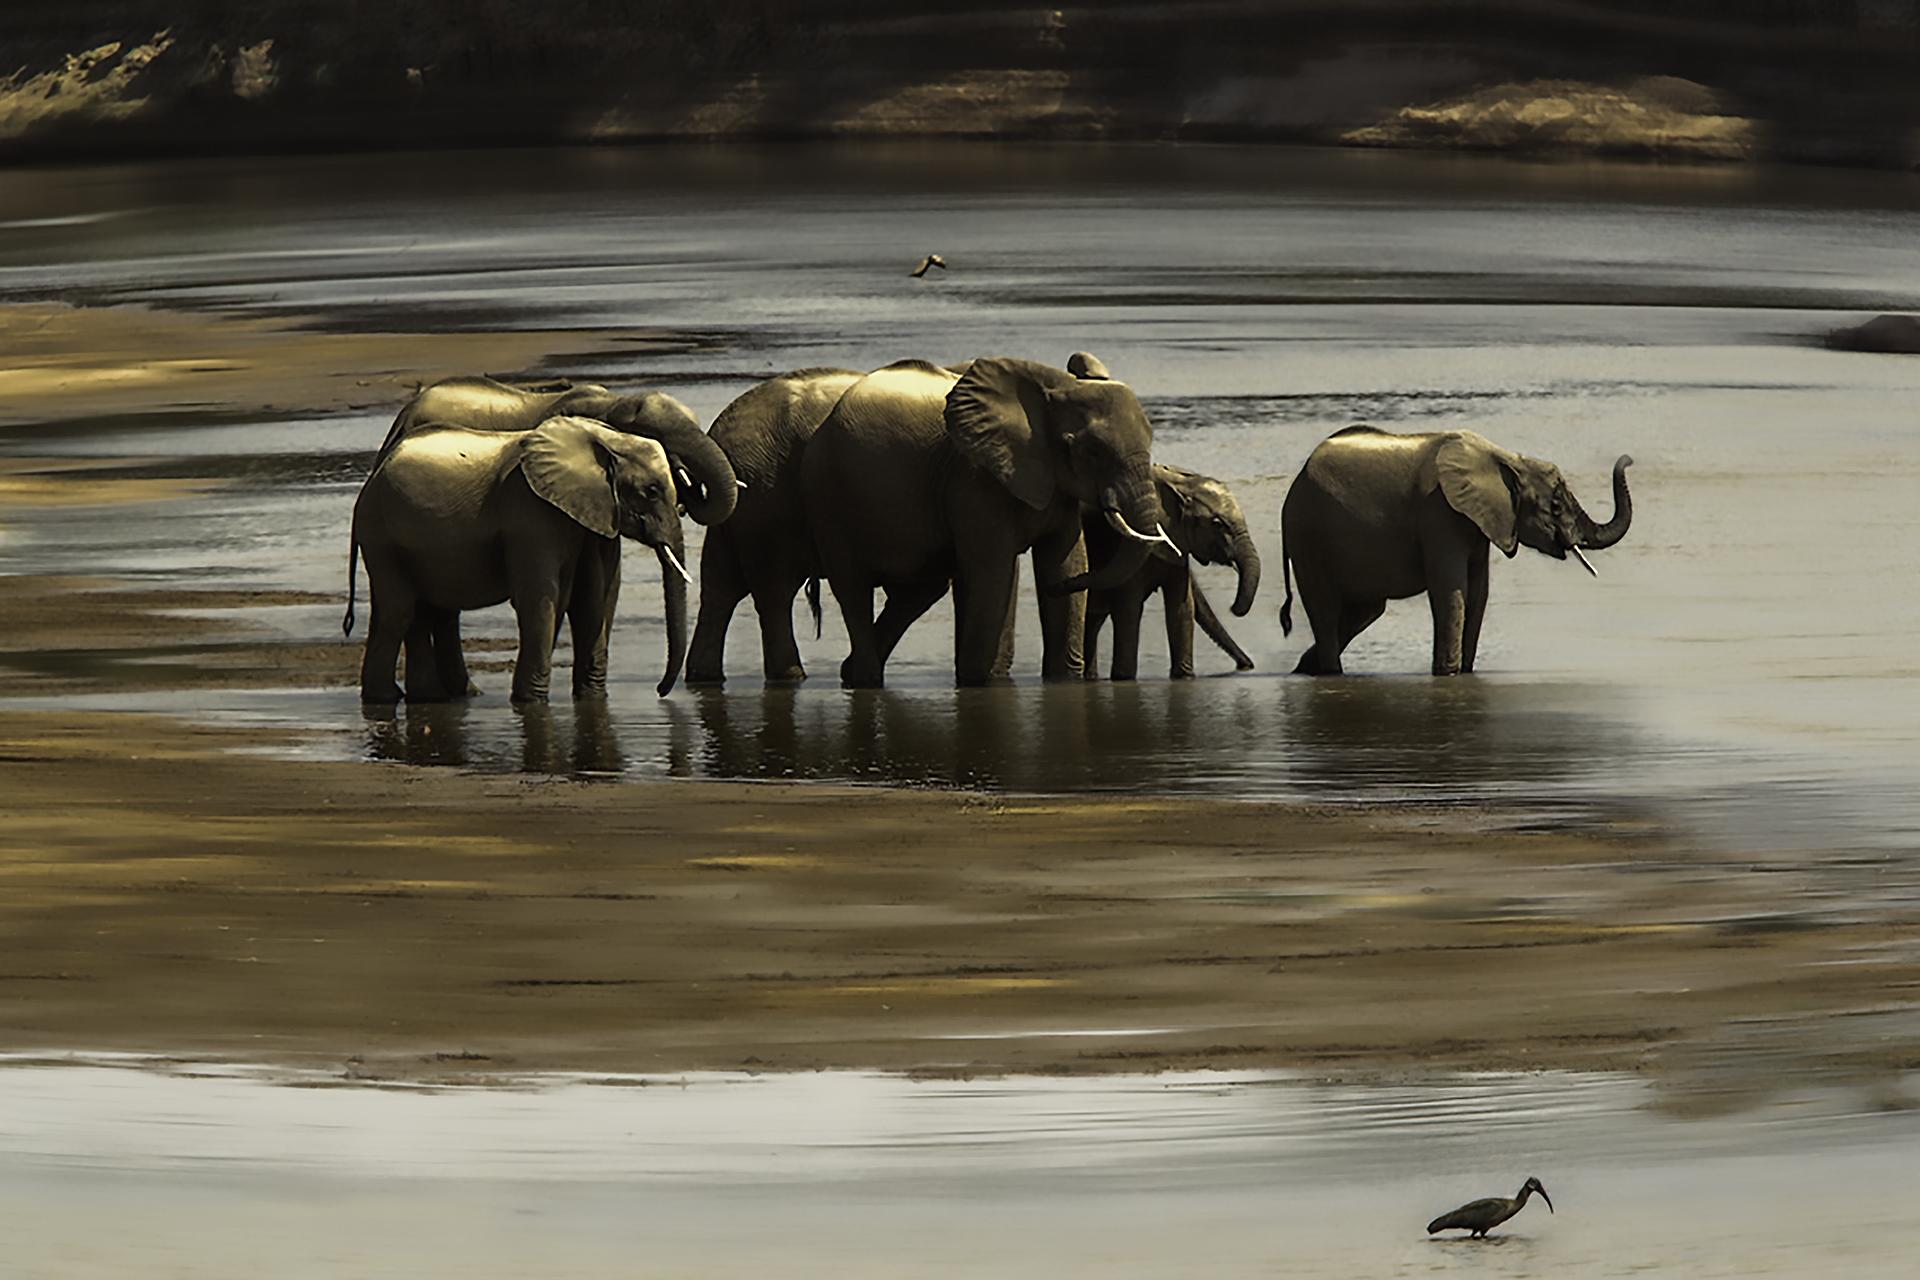 20x30 ZAMBIA RIVER ELEPHANTS